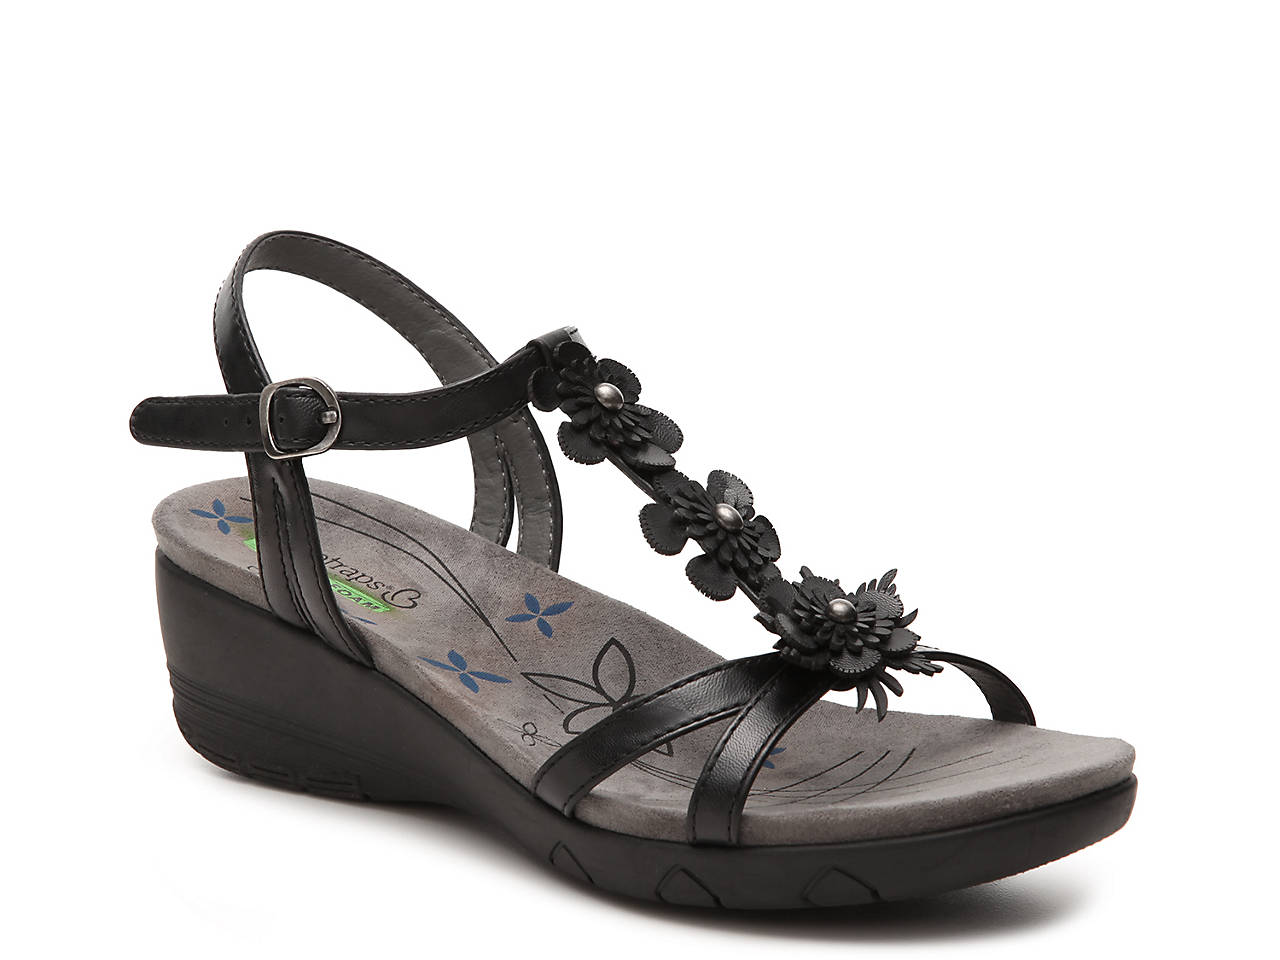 4d06cdbcc683 Bare Traps Hammond Wedge Sandal Women s Shoes